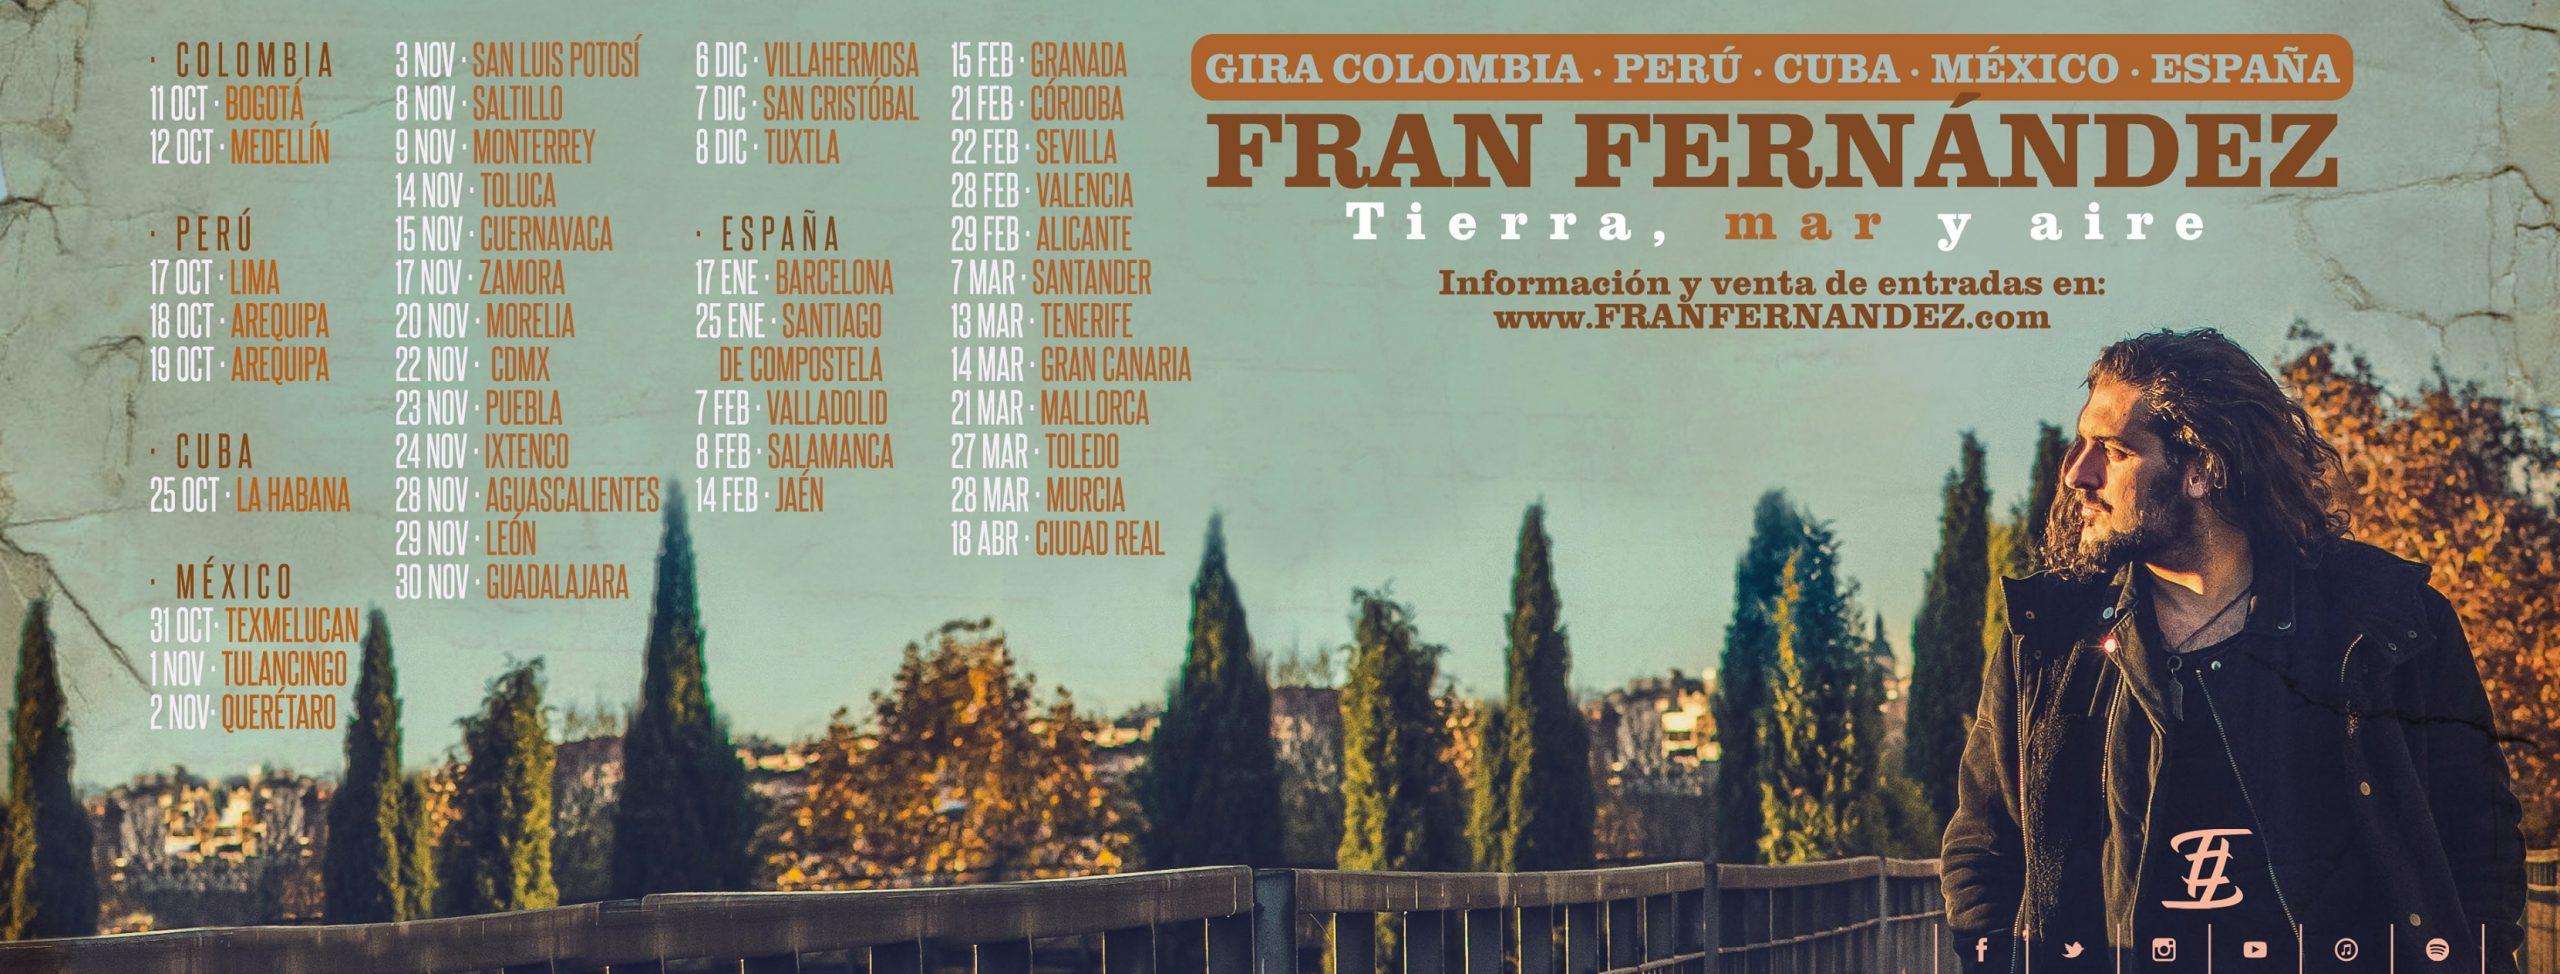 gira mex 2019 FF